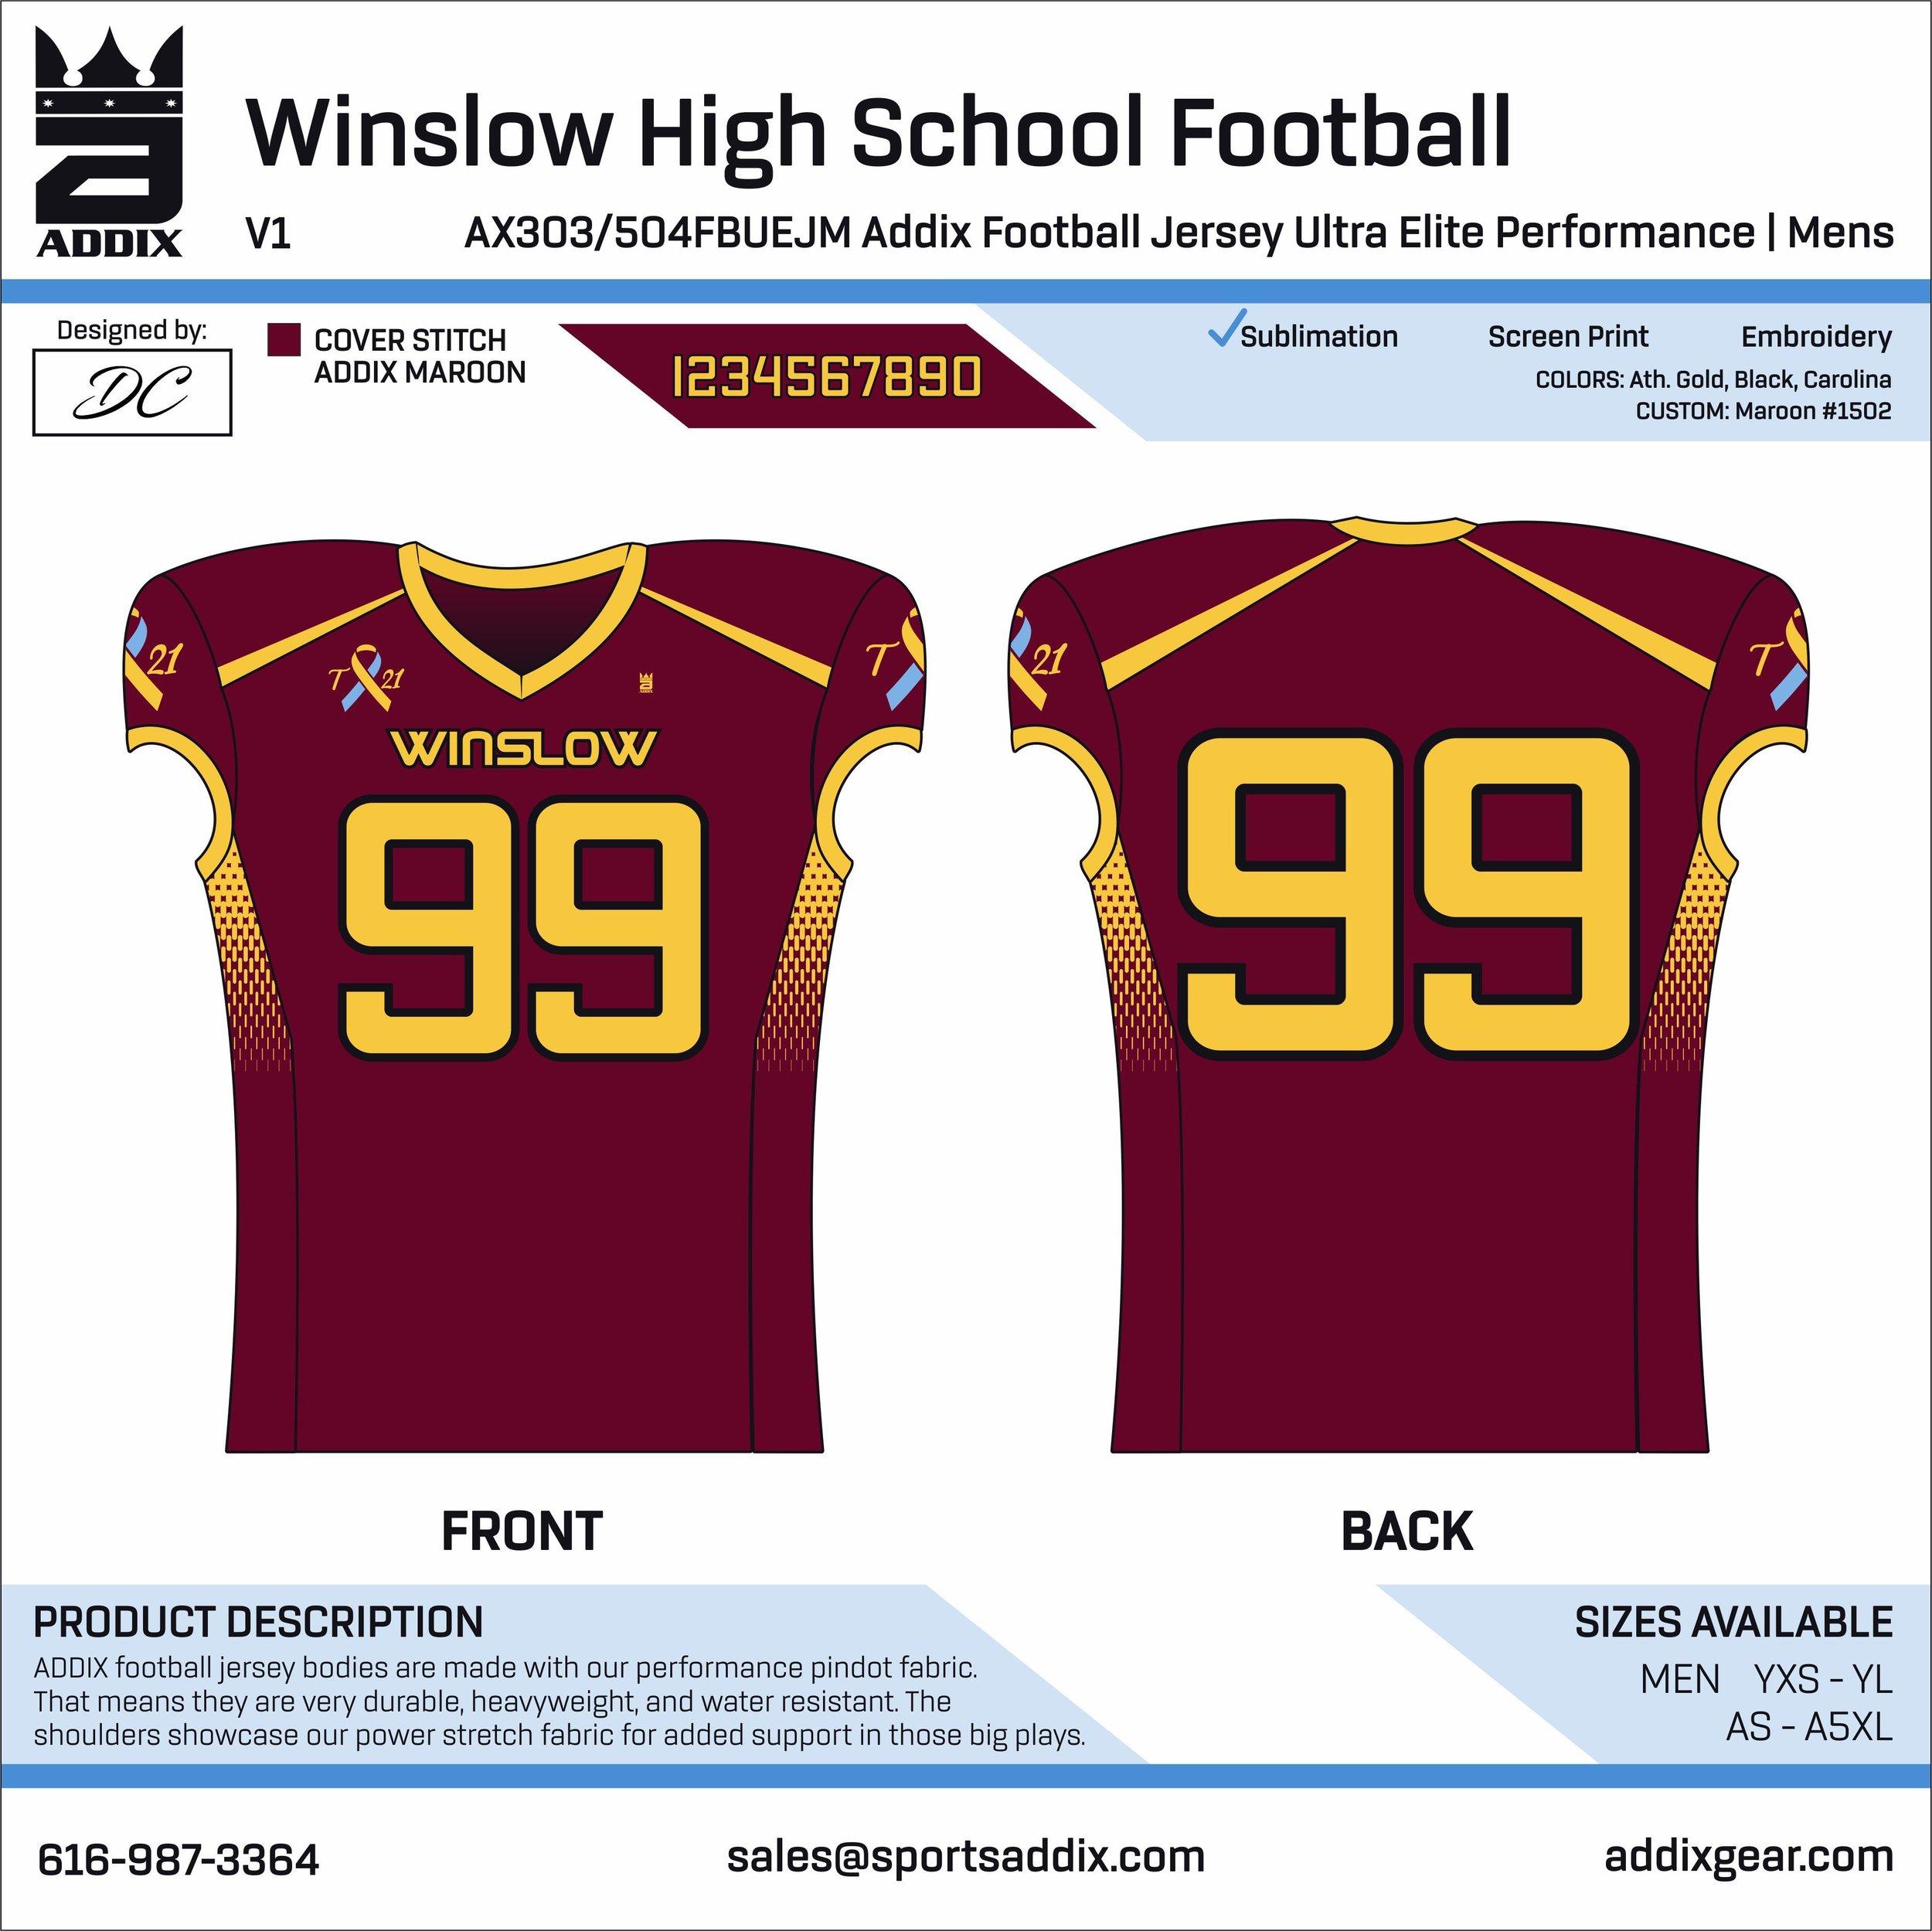 Winslow High School Football_2019_8-19_DC_UEP Jersey (1).jpg